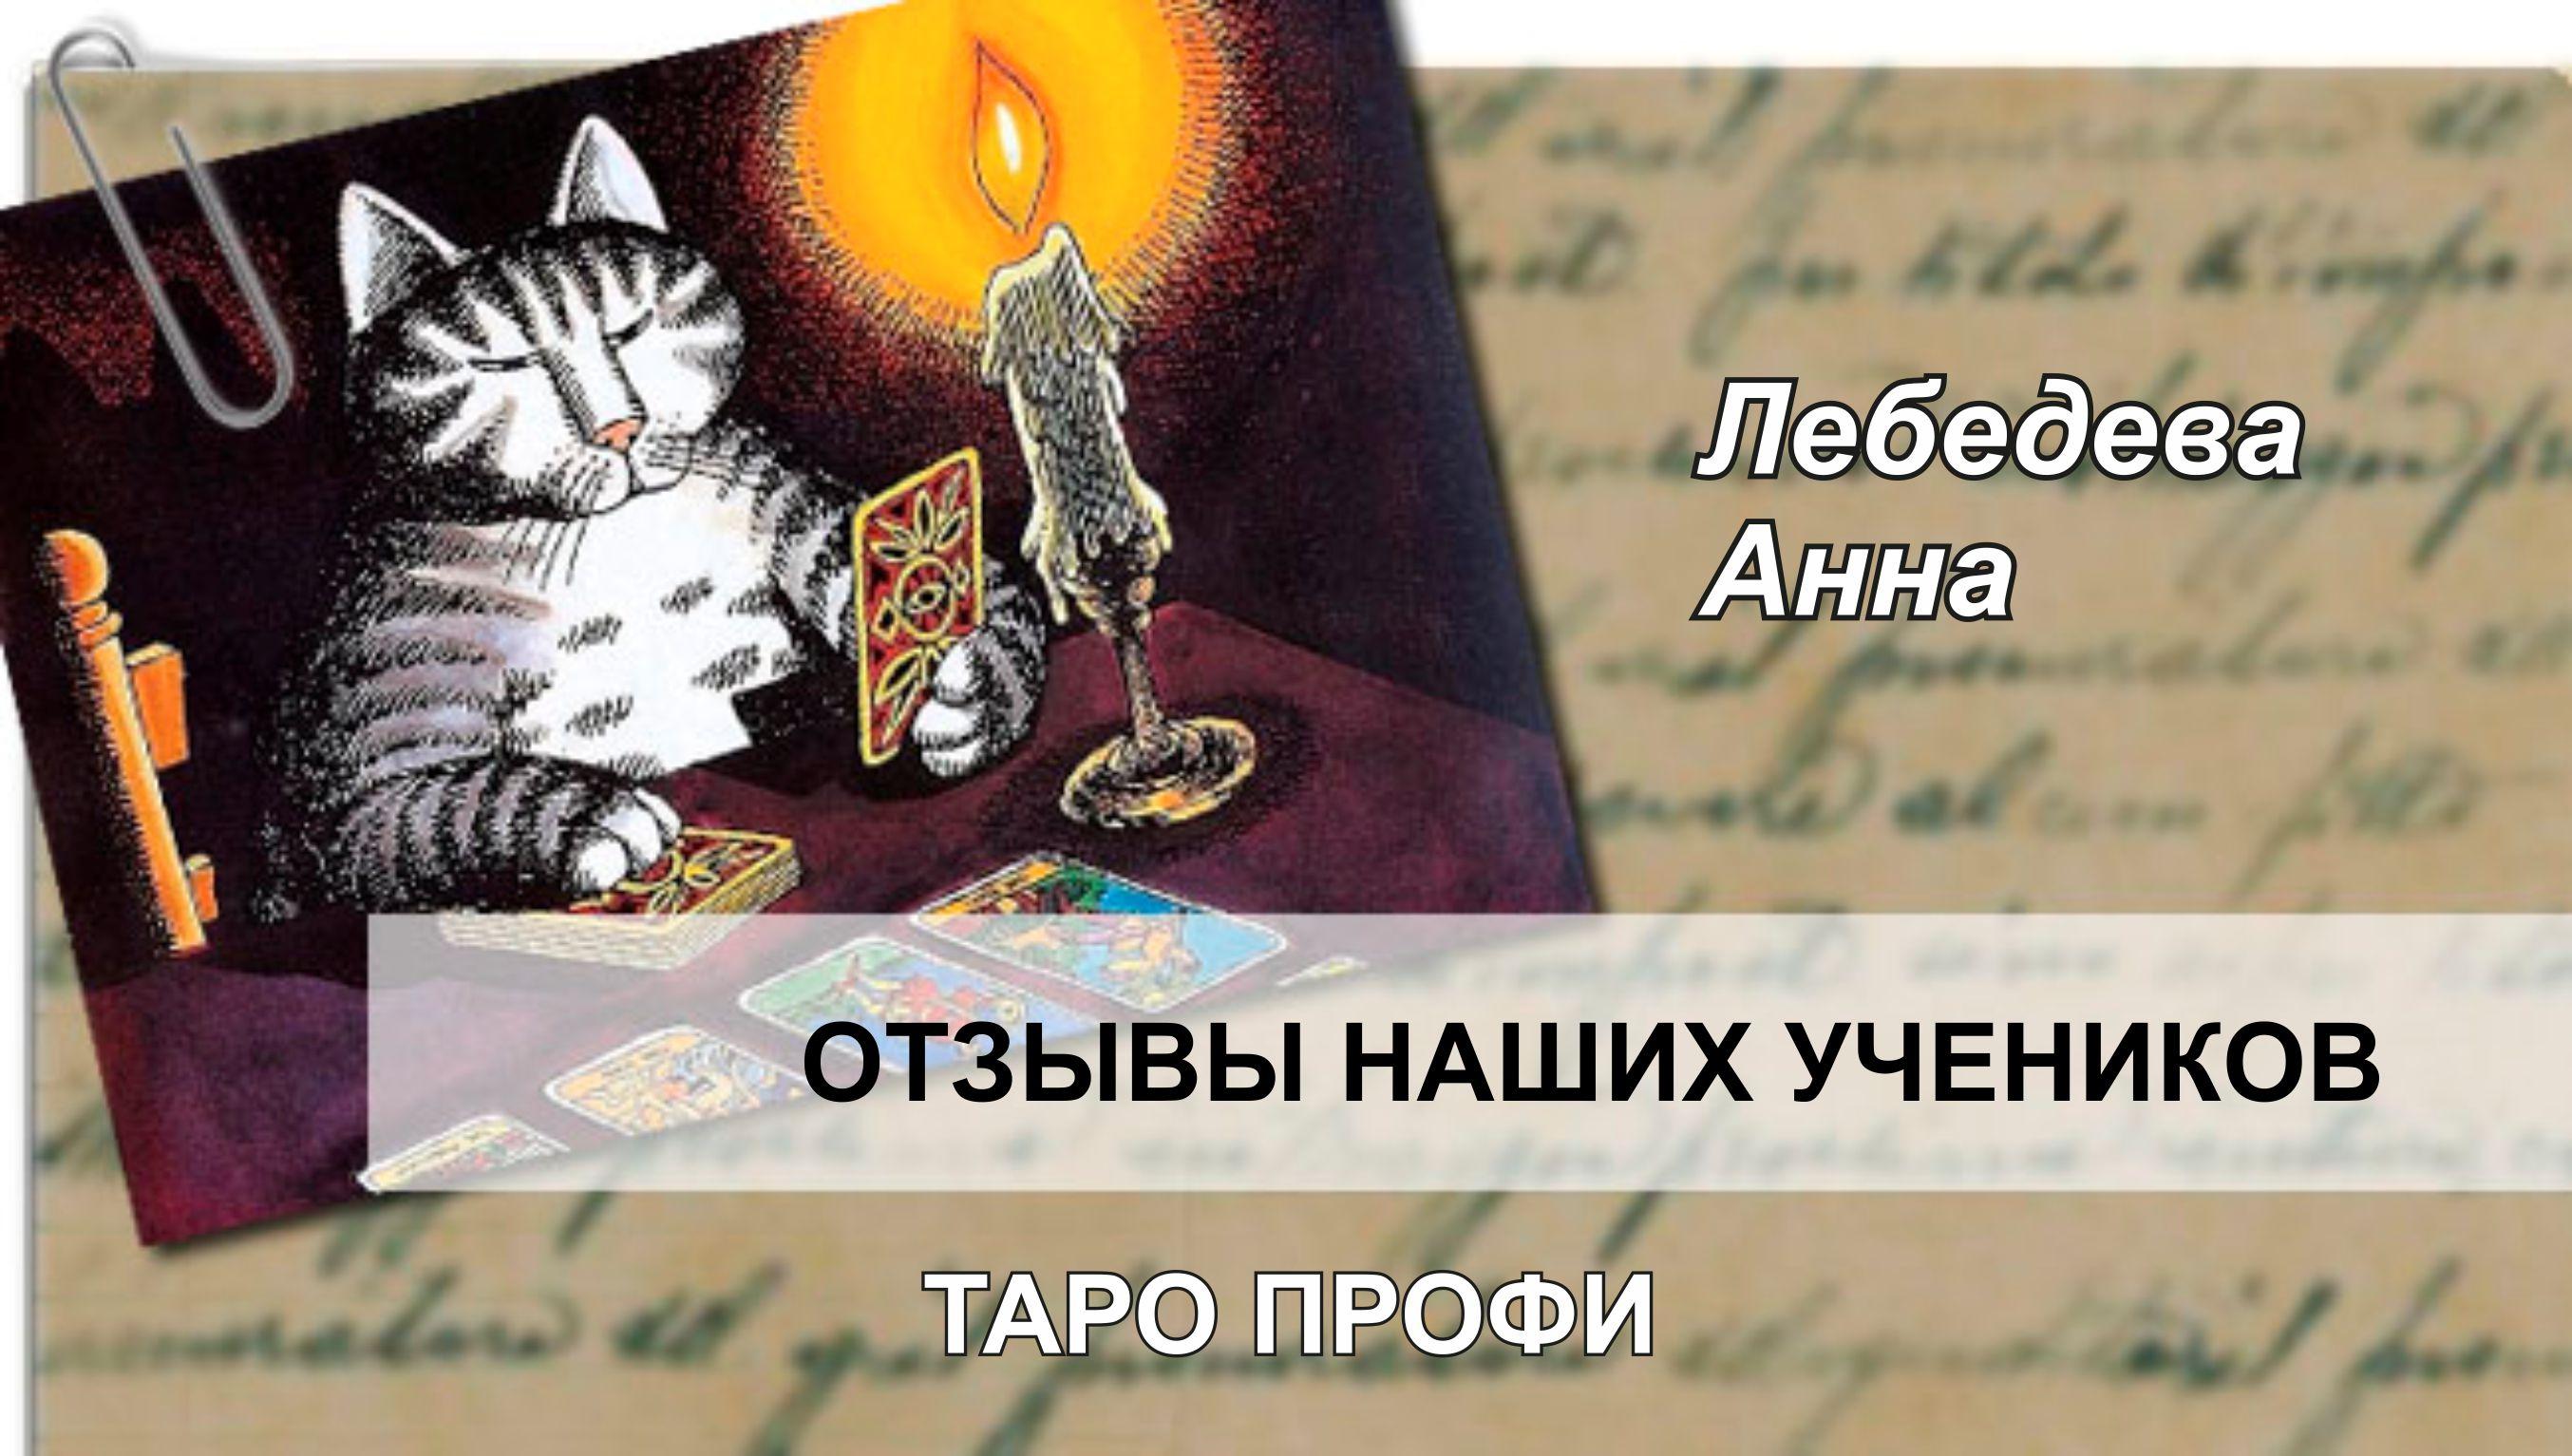 Лебедева Анна отзыв Таро Профи